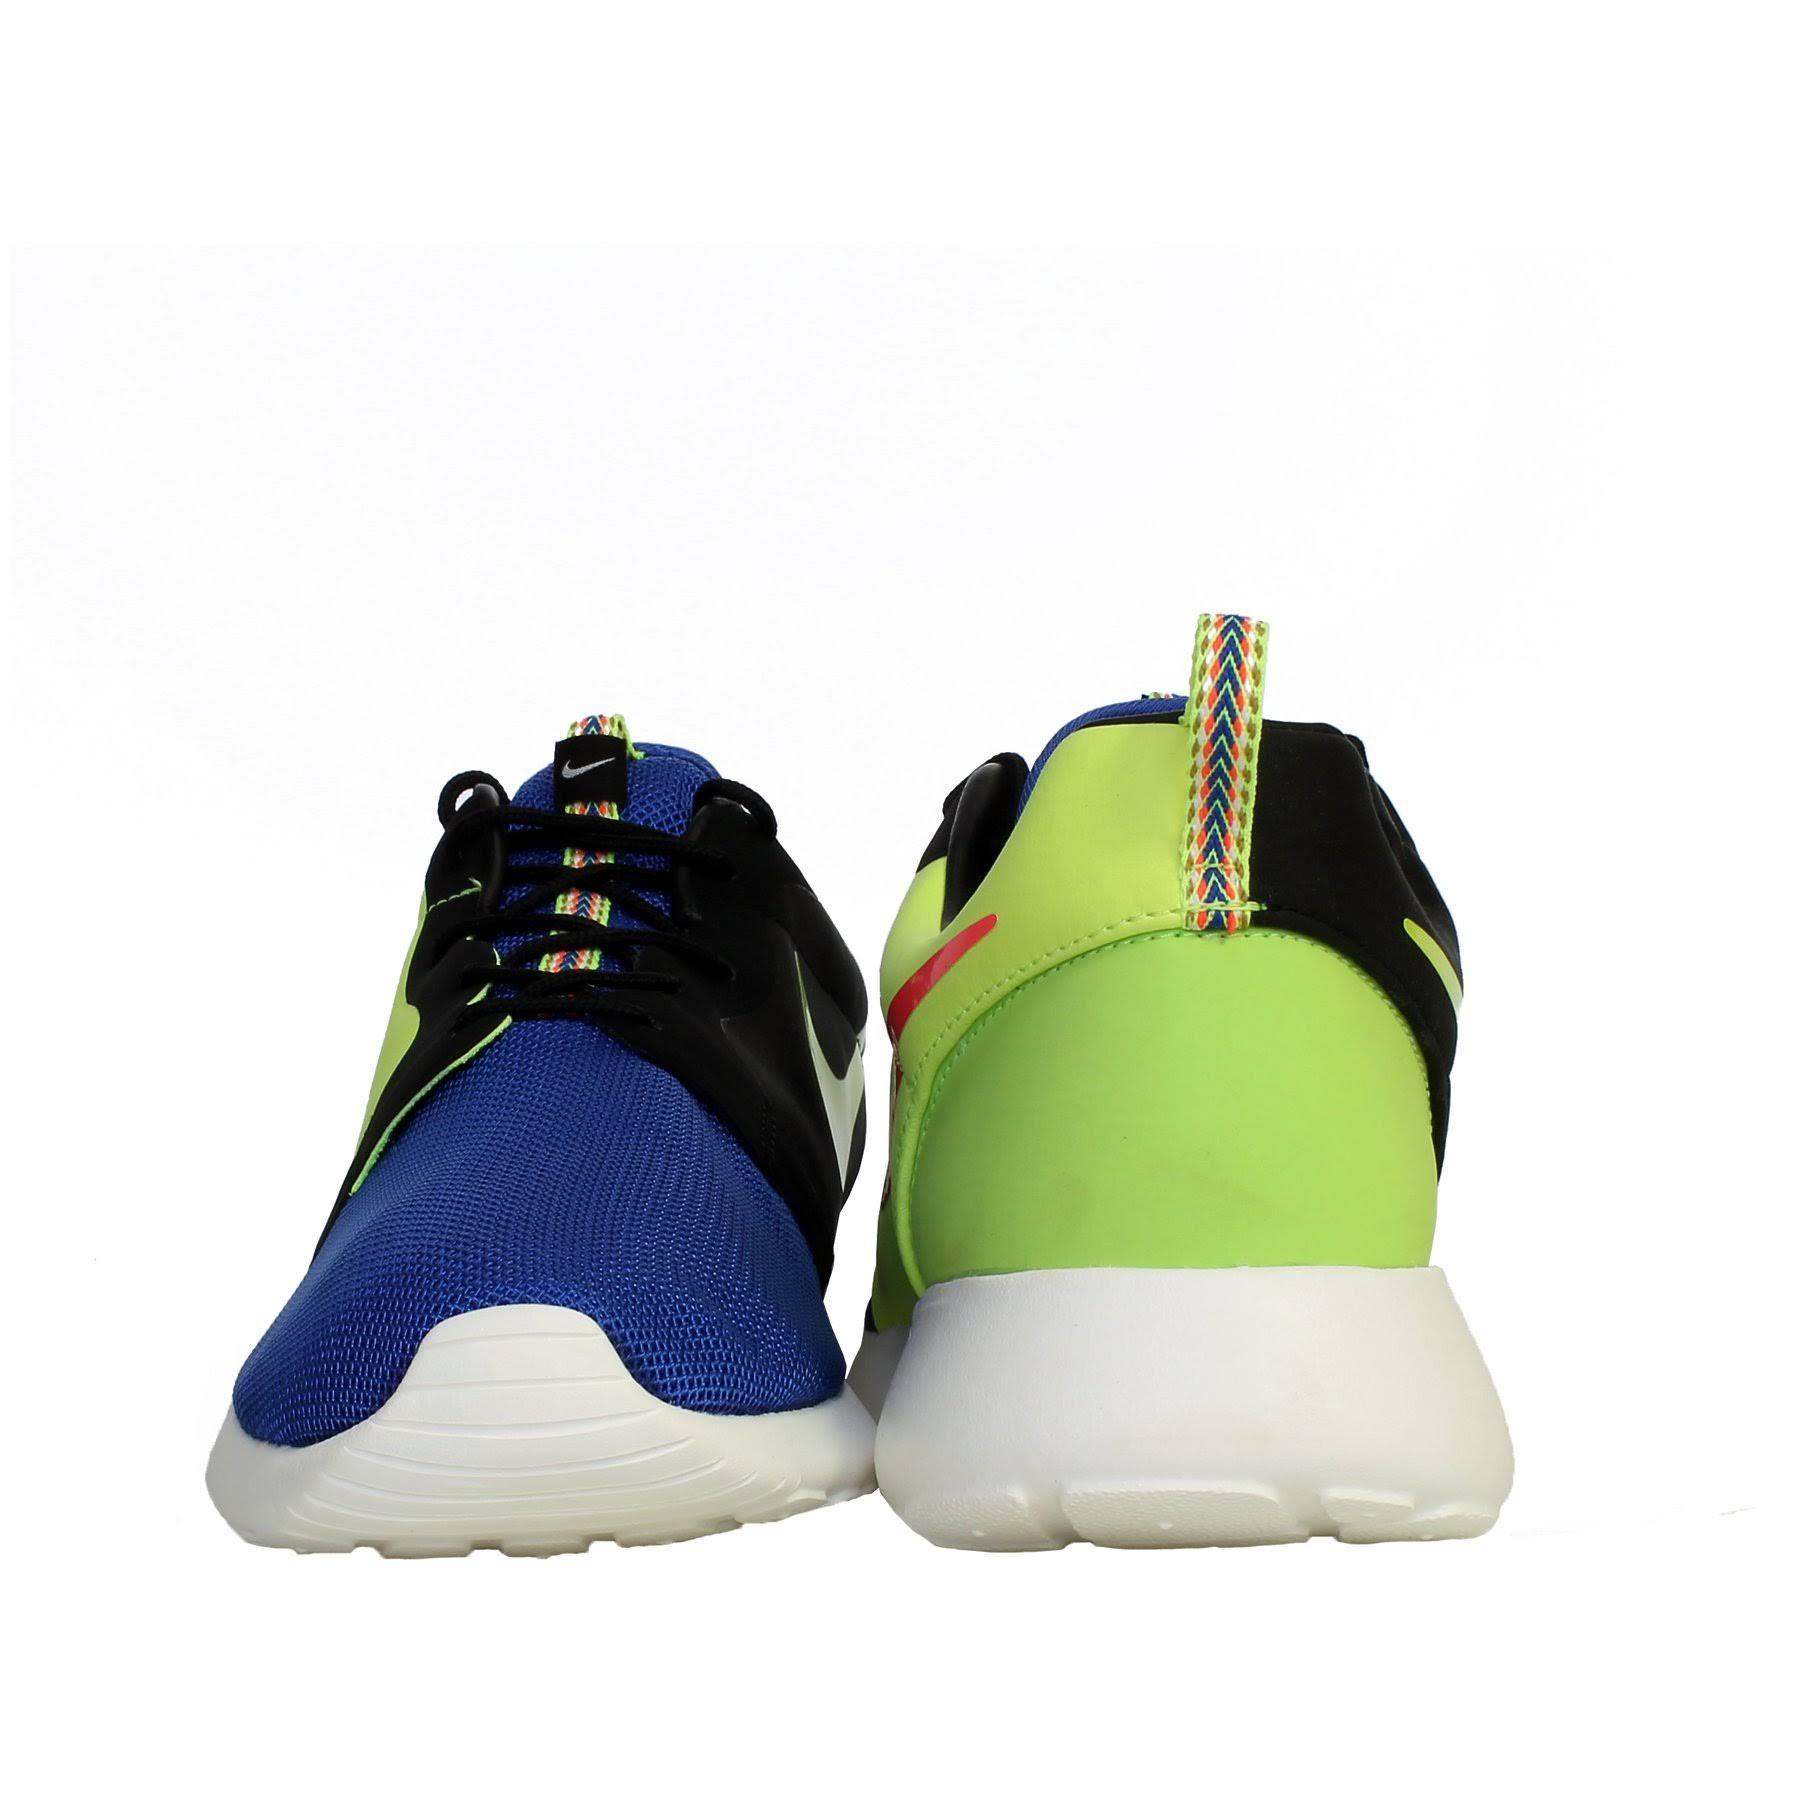 10 Roshe Größe Hyp Herrenschuhe Pr One Weiß 5 Nike YwzdqO1